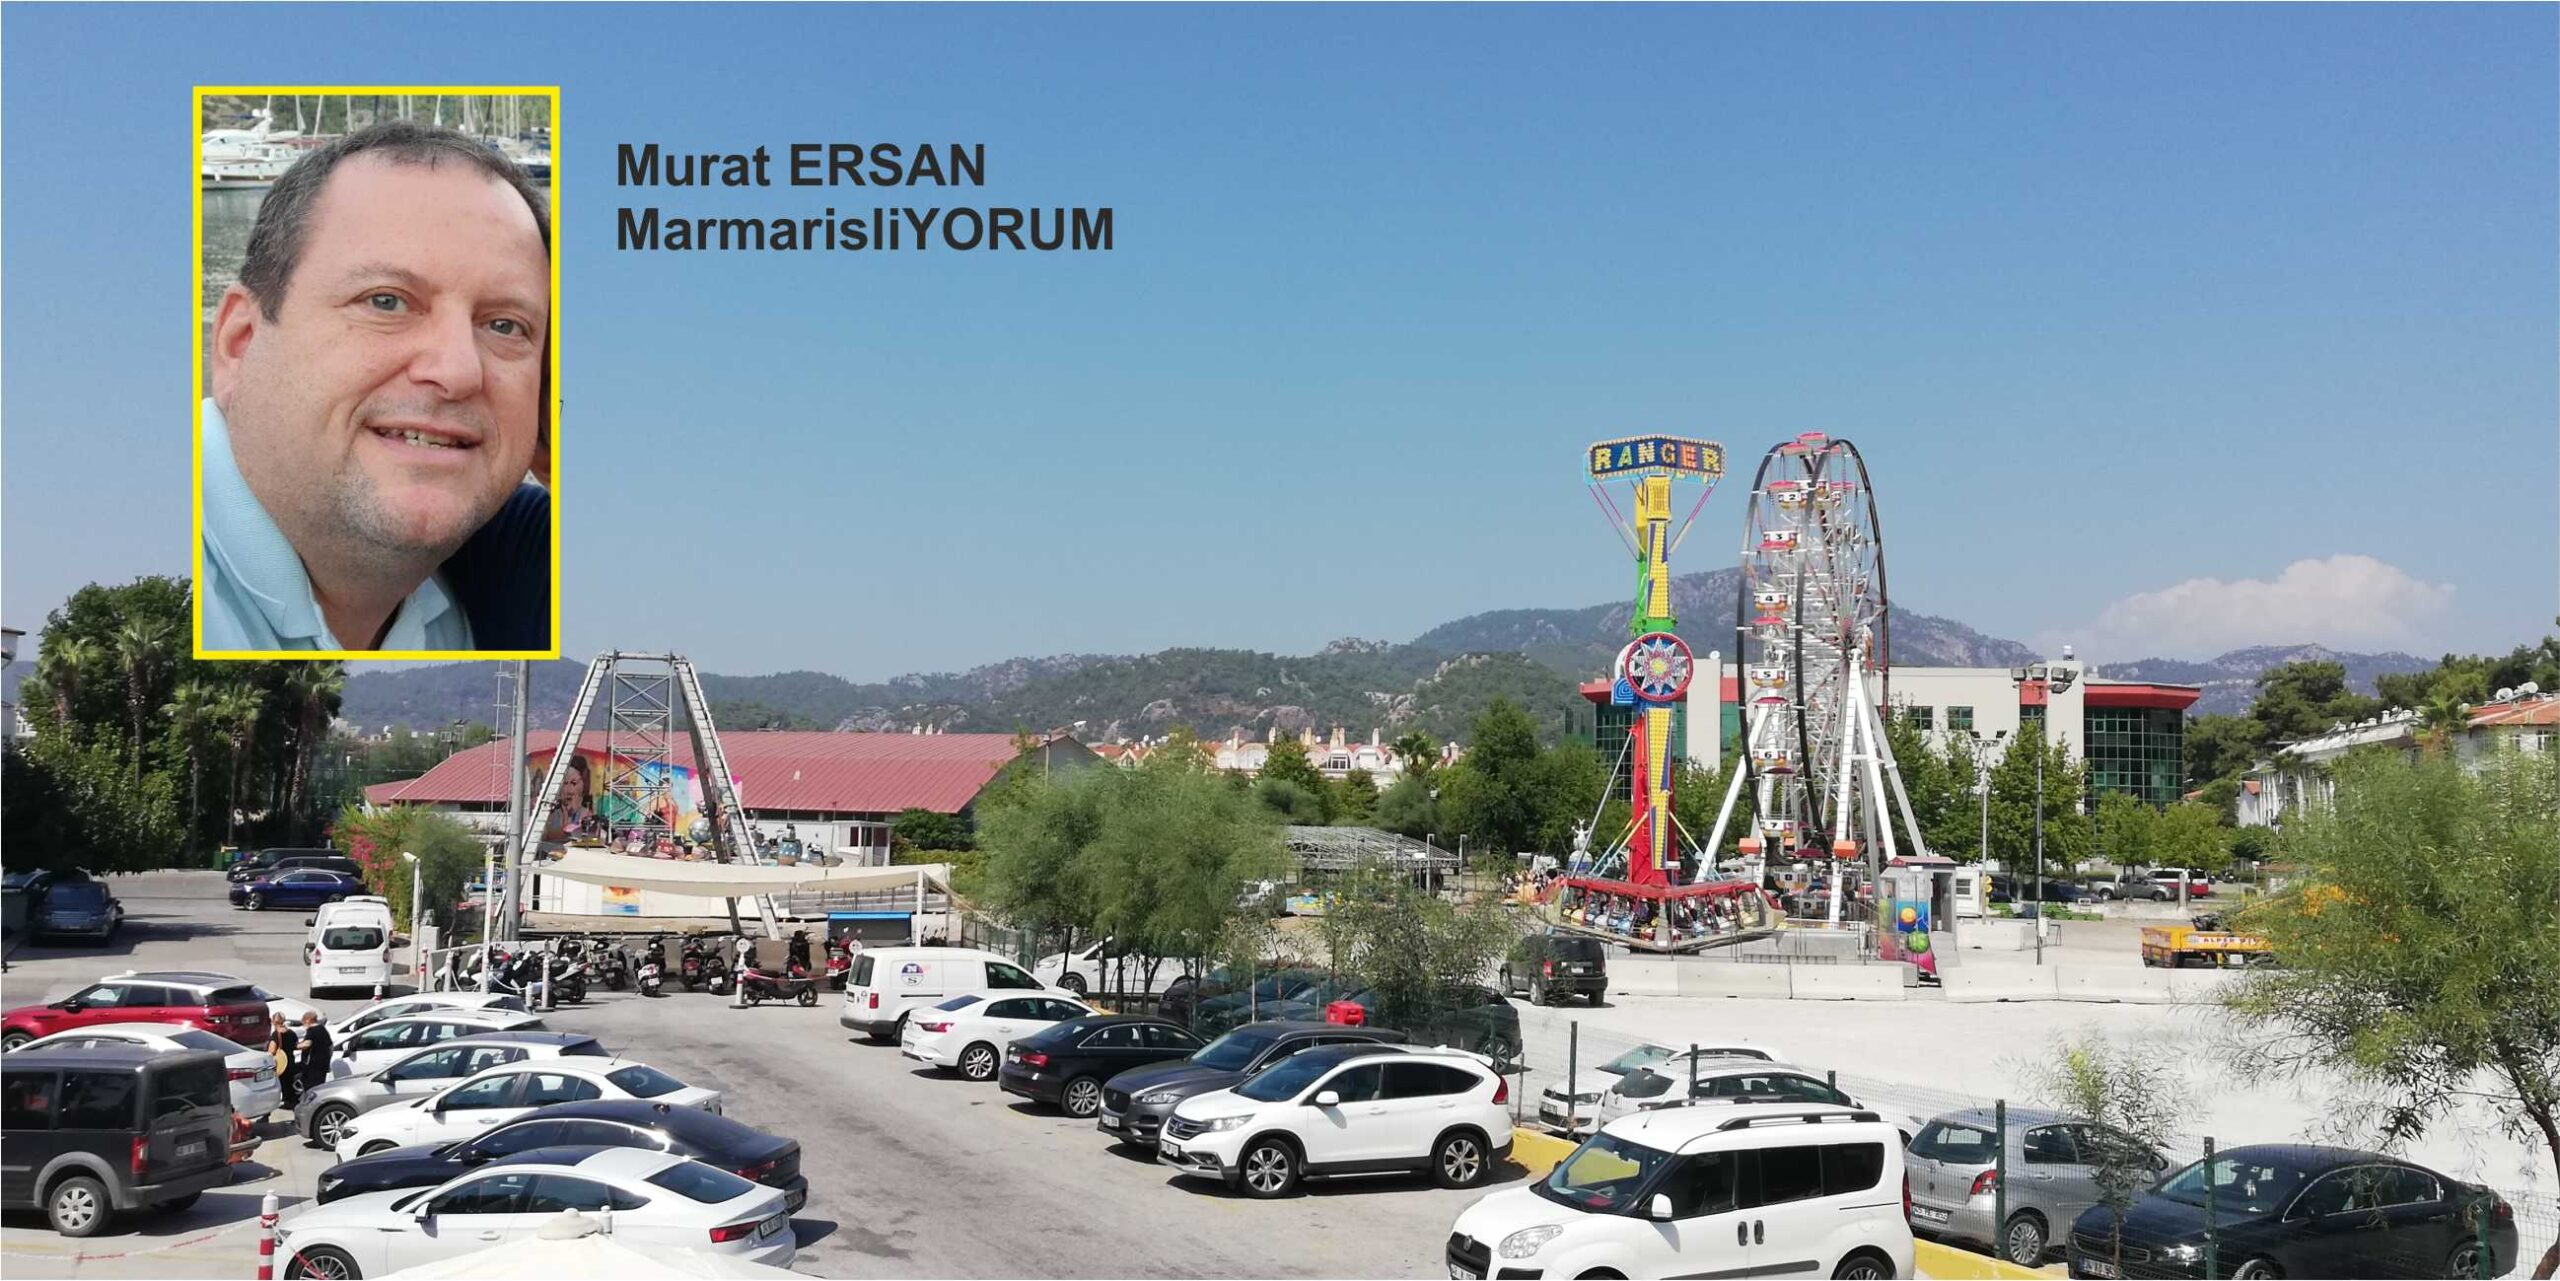 Murat Ersan